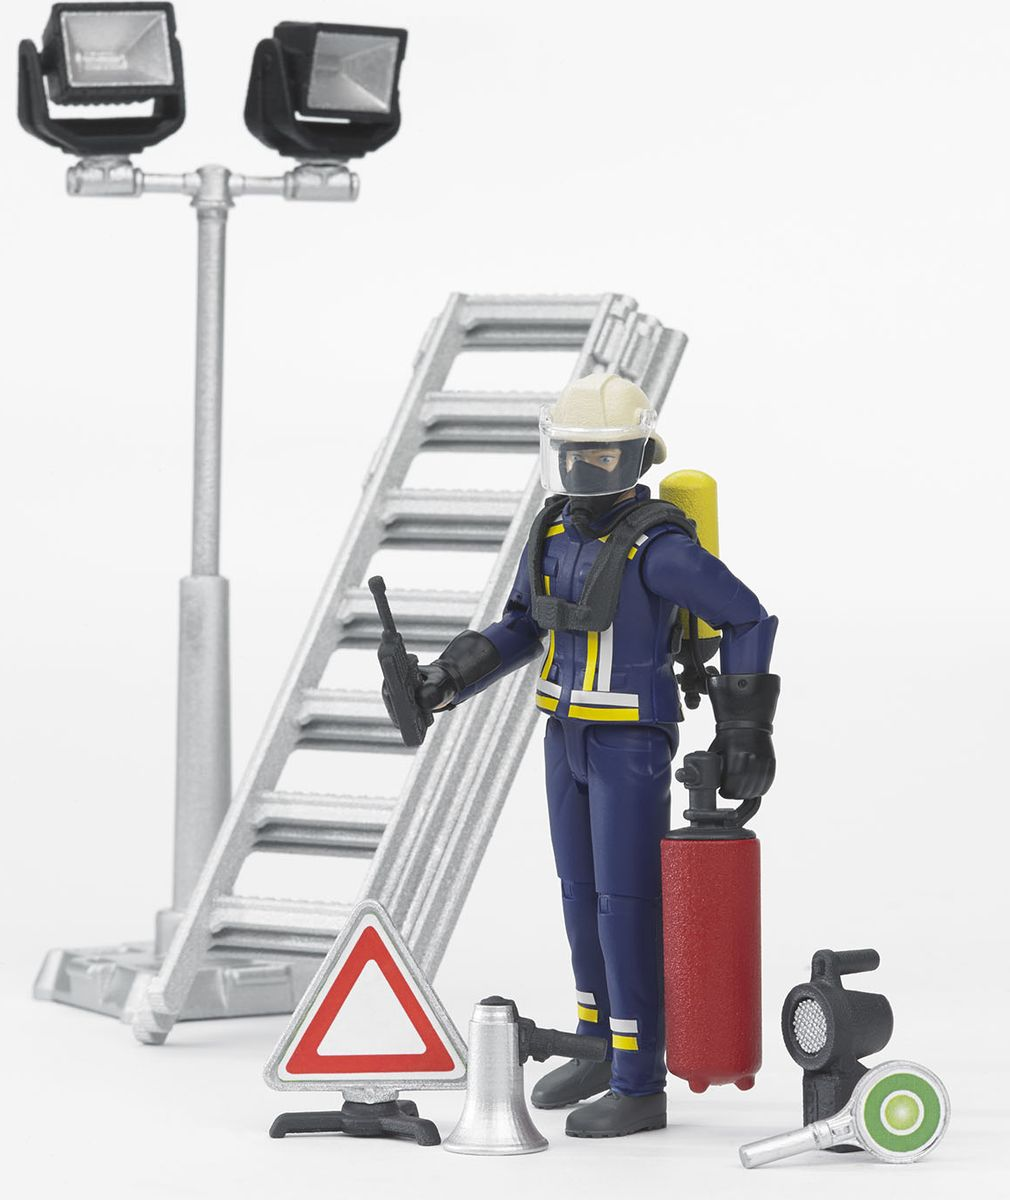 Bruder Фигурка пожарного с аксессуарами